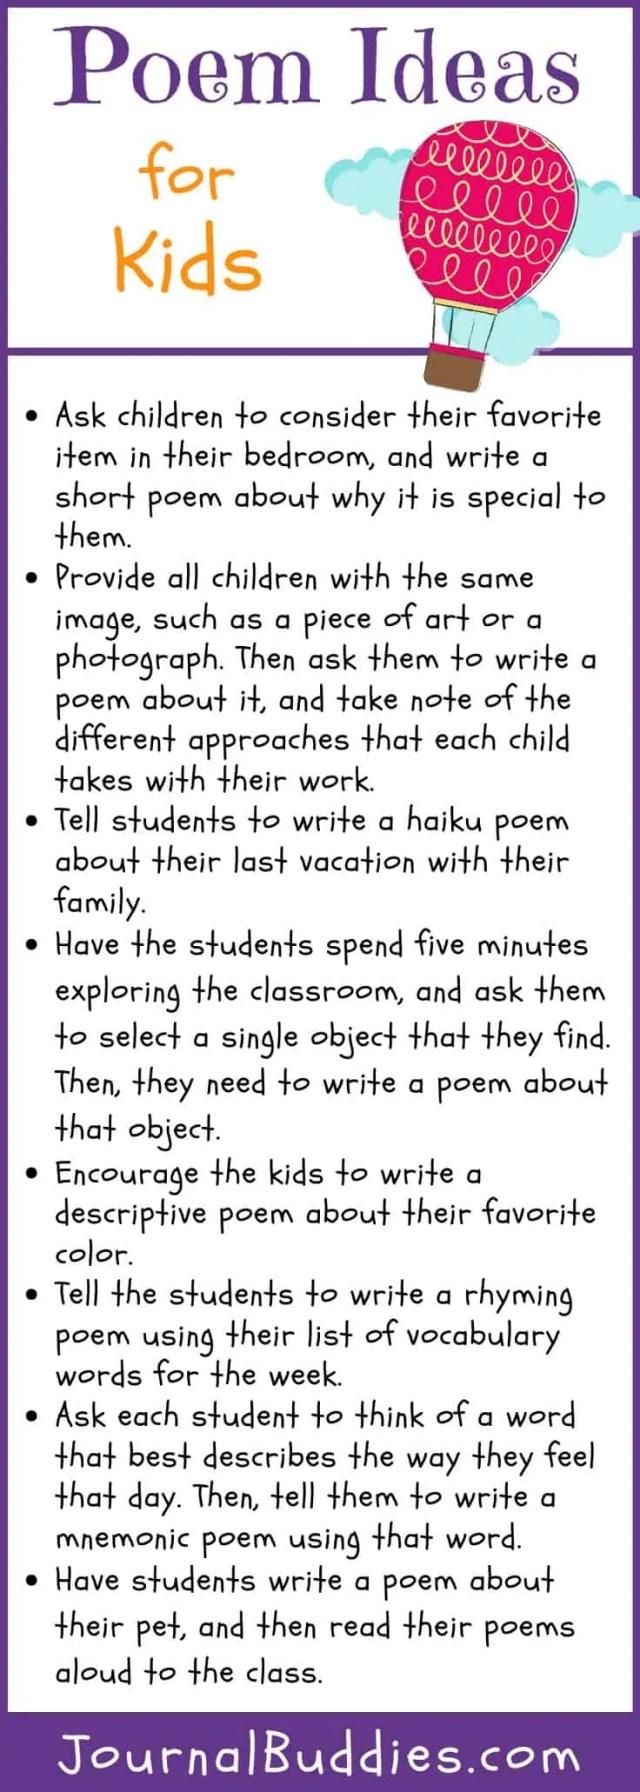 Poem Ideas for Kids • JournalBuddies.com